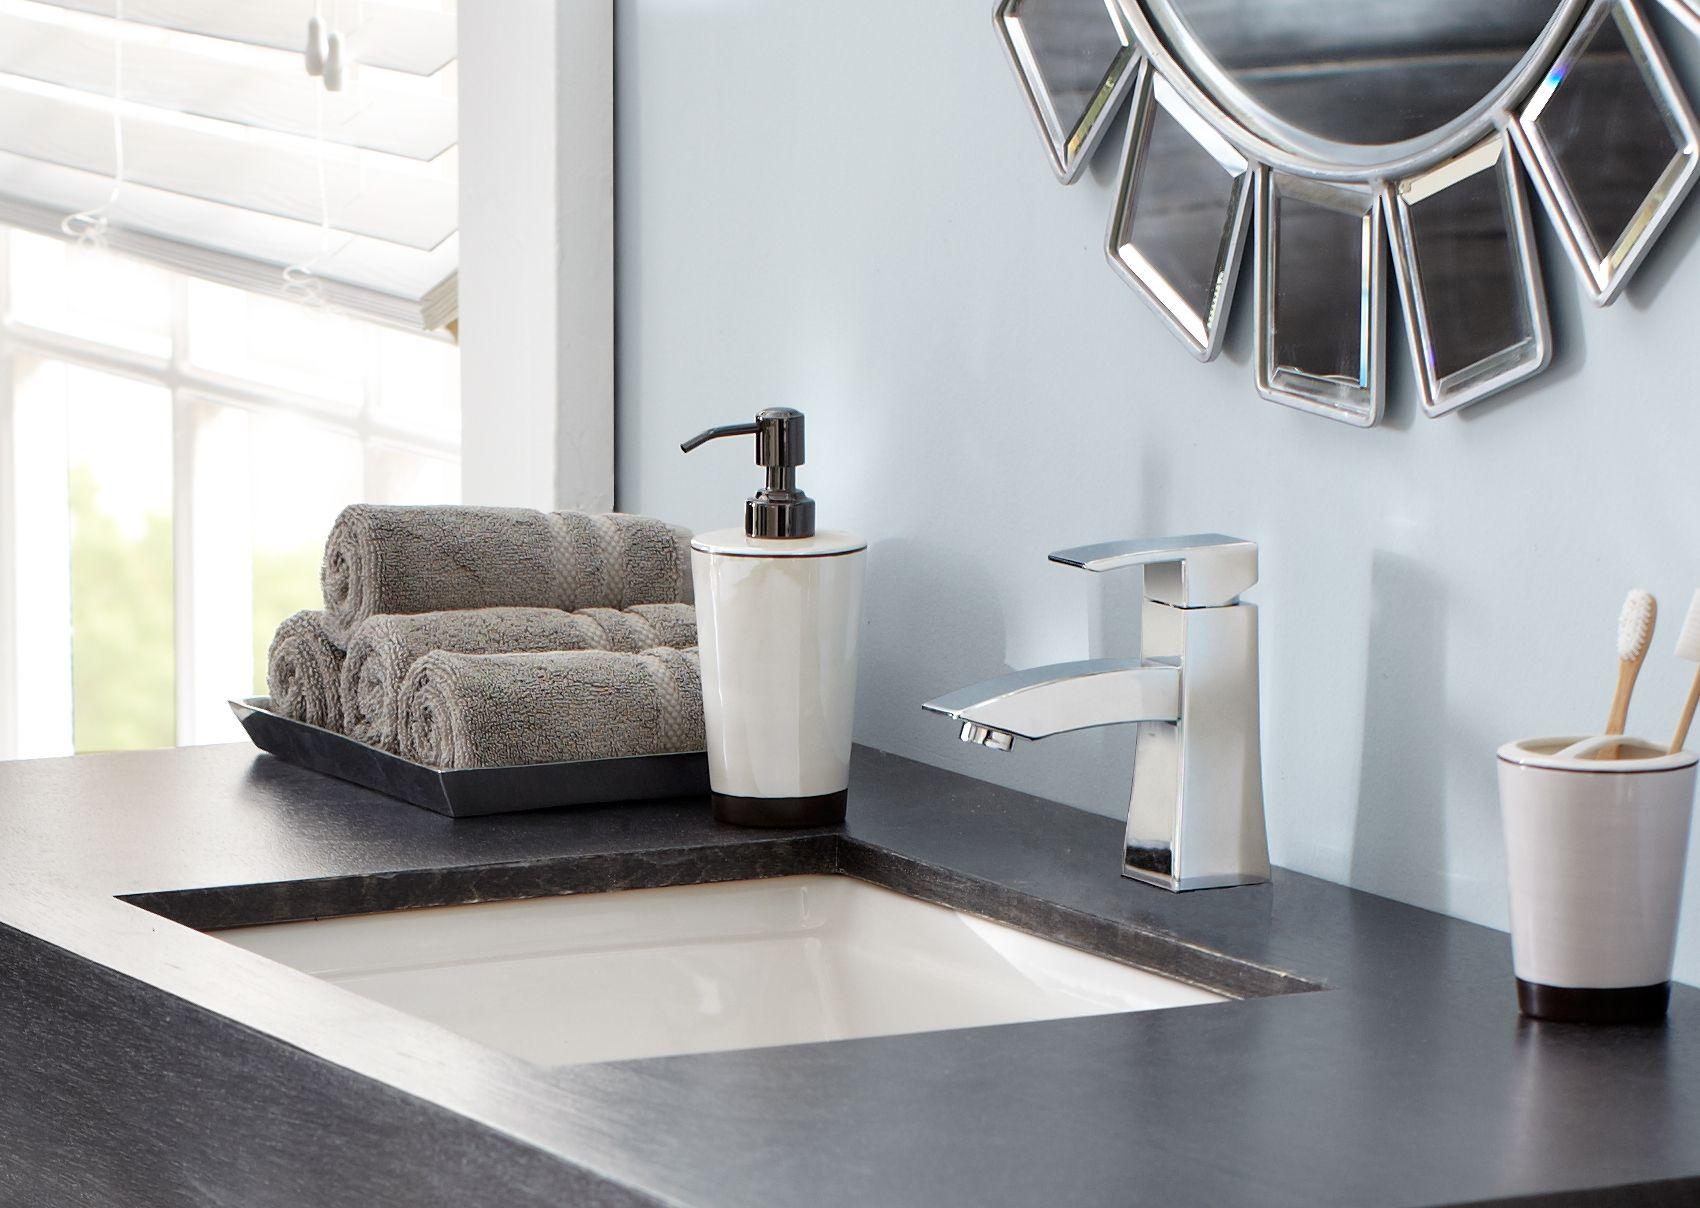 Danze Logan Square single handle faucet | In the Bathroom ...